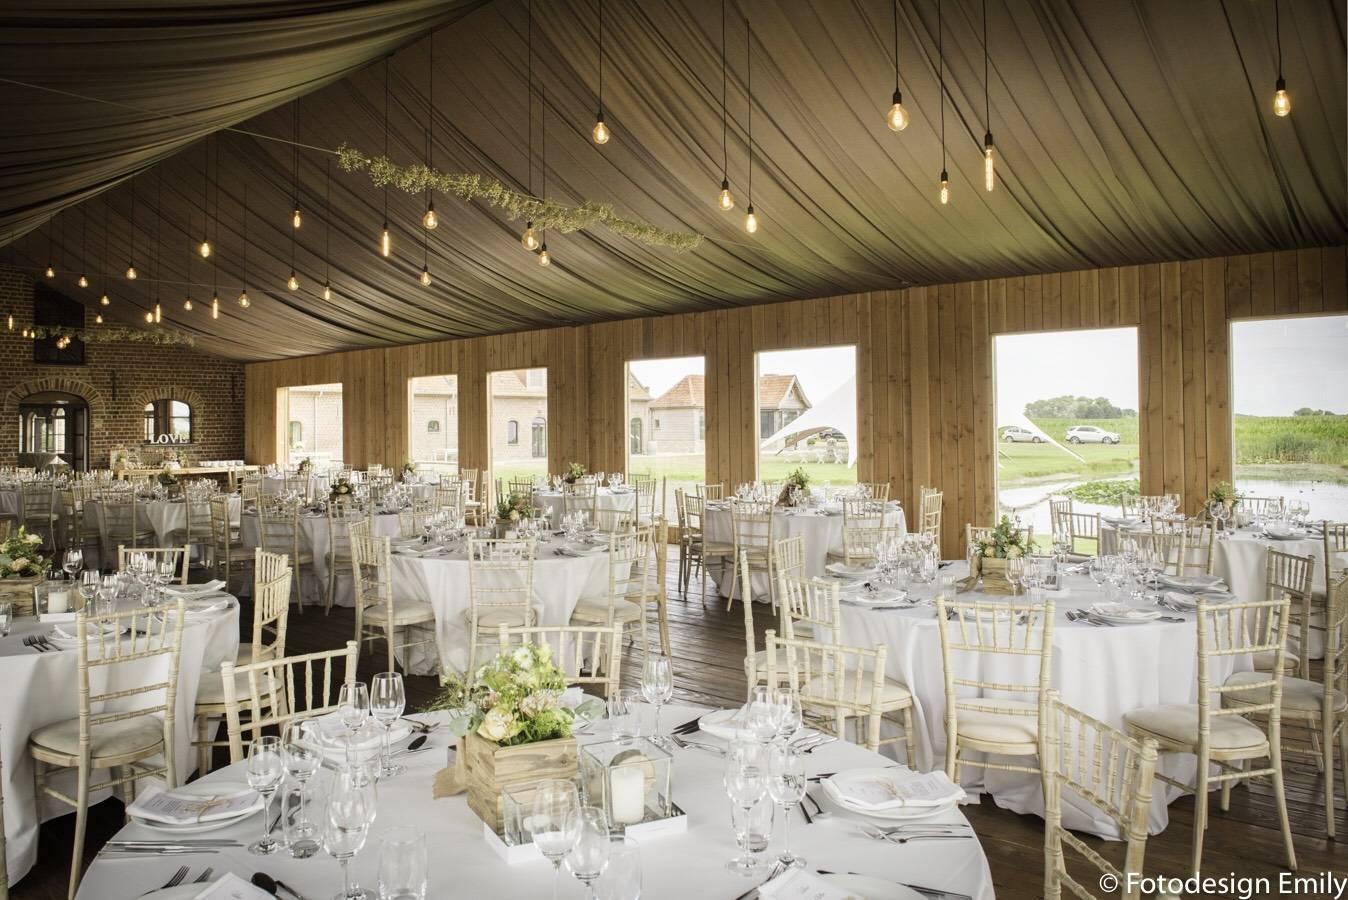 House of Weddings Domein t Eikennest Feestzaal West-Vlaanderen Diksmuide Beerst 5